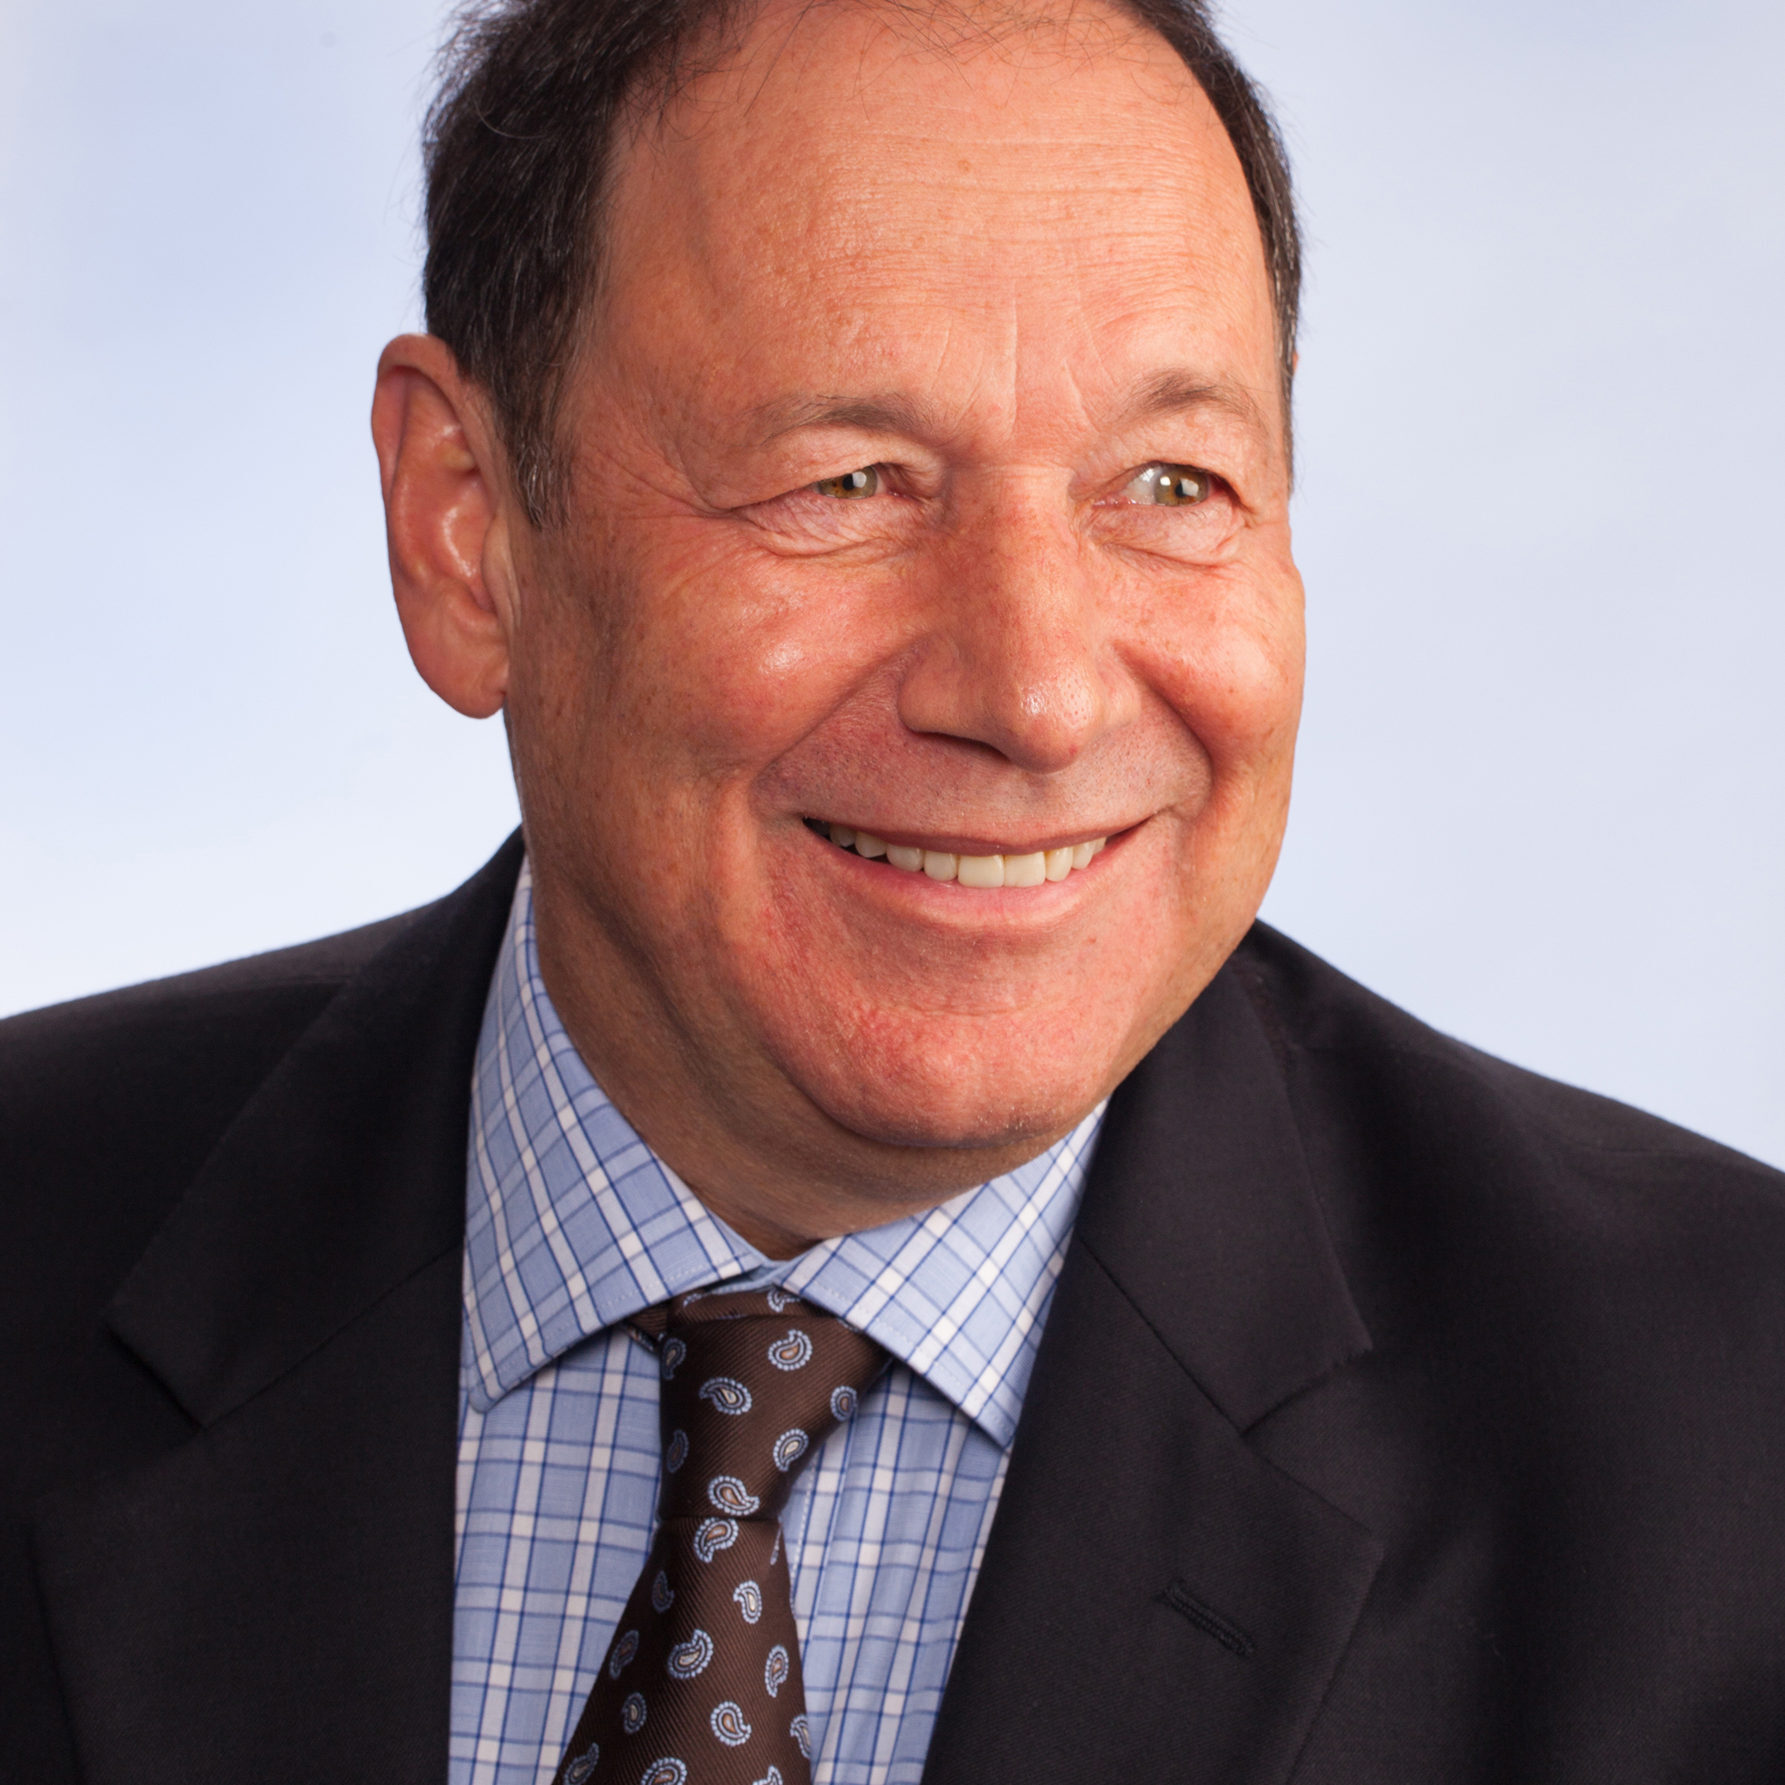 Associate Professor Mark Cordato BDS, MDSc, MRACDS, FICD, FADI, FPFA. Orthodontist at Lithgow valley Smiles.